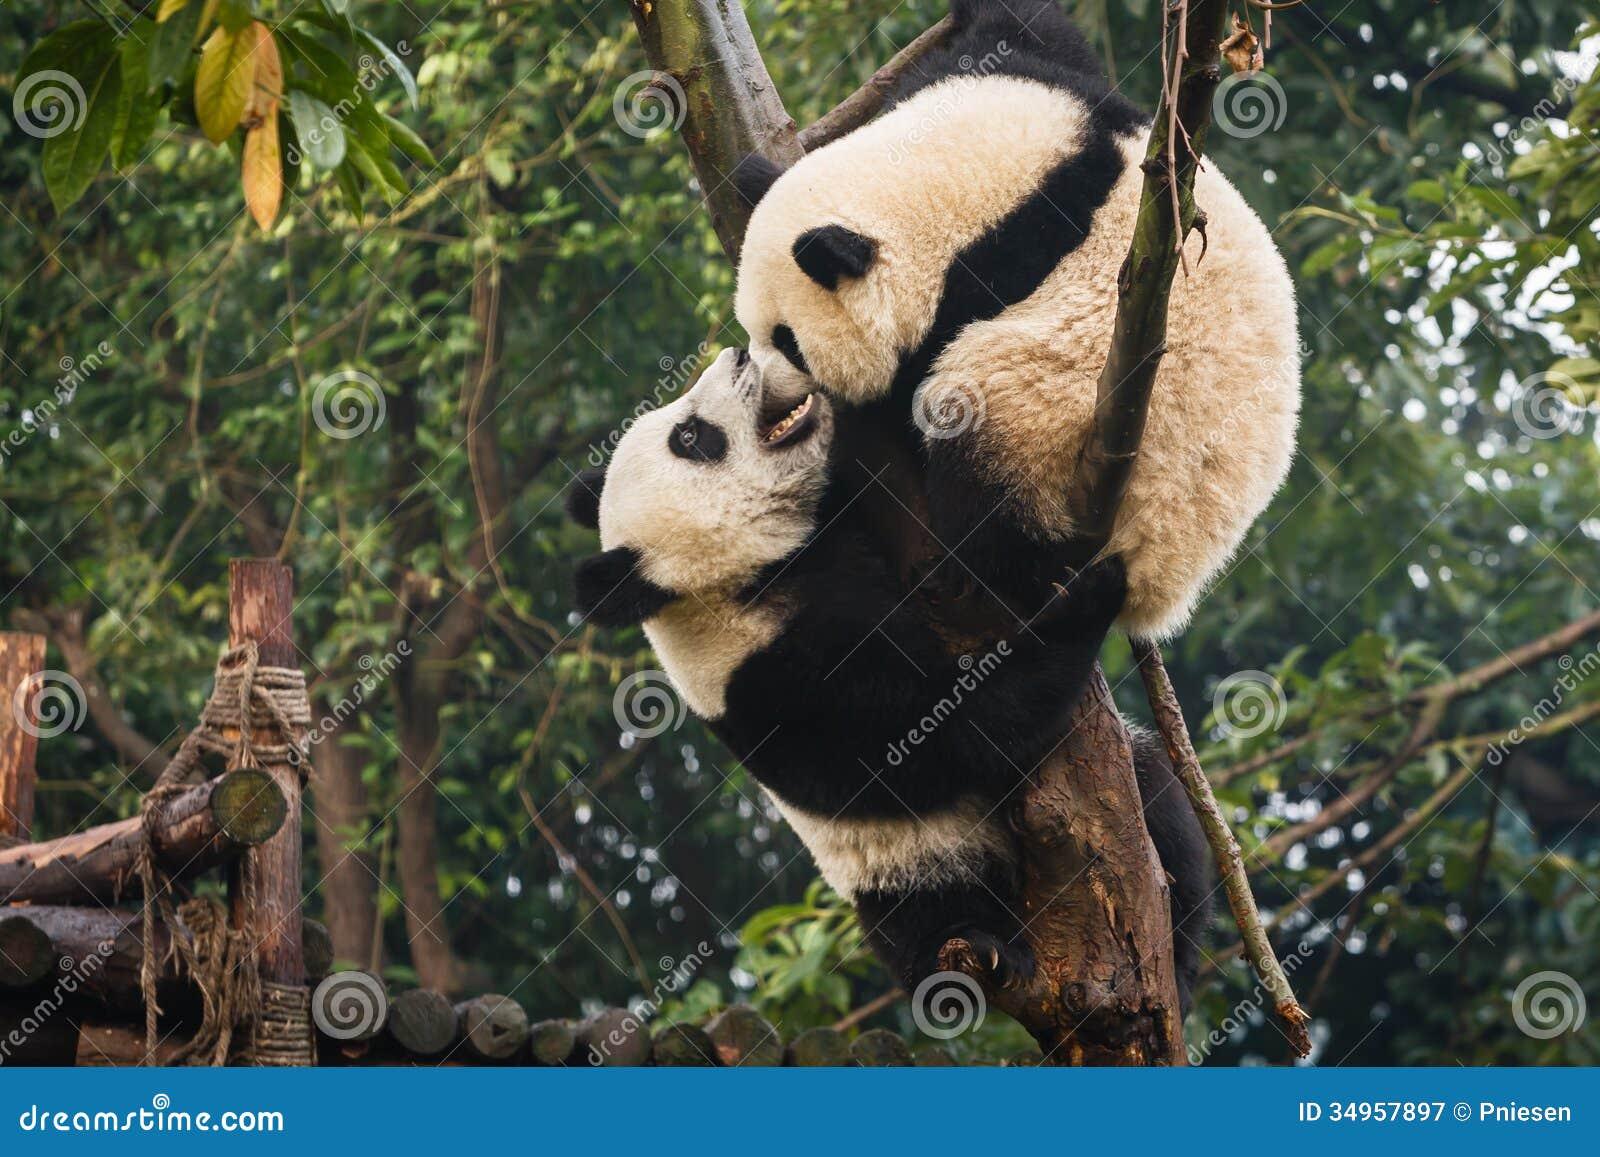 Two Panda Bear Cubs Playing At Chengdu Research Base China